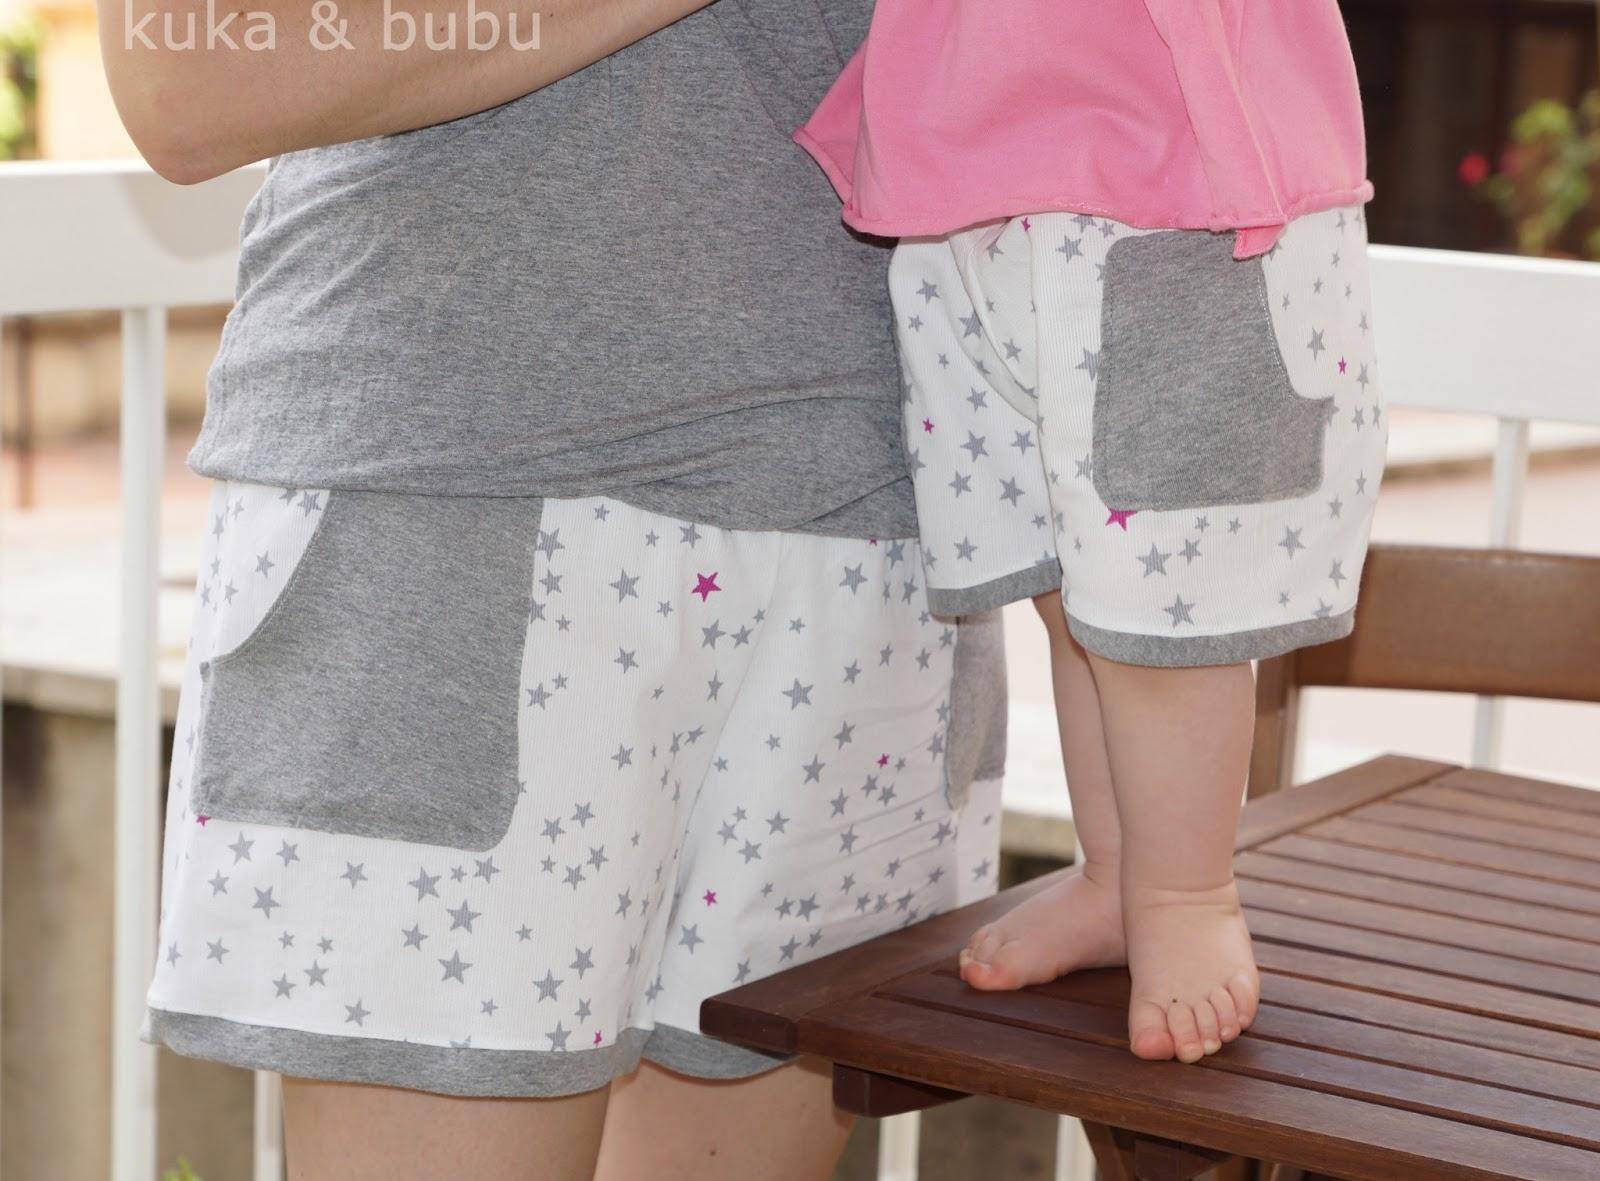 http://kukaandbubu.blogspot.com.es/2013/07/shorts-squared-shorts-al-cuadrado-cose.html